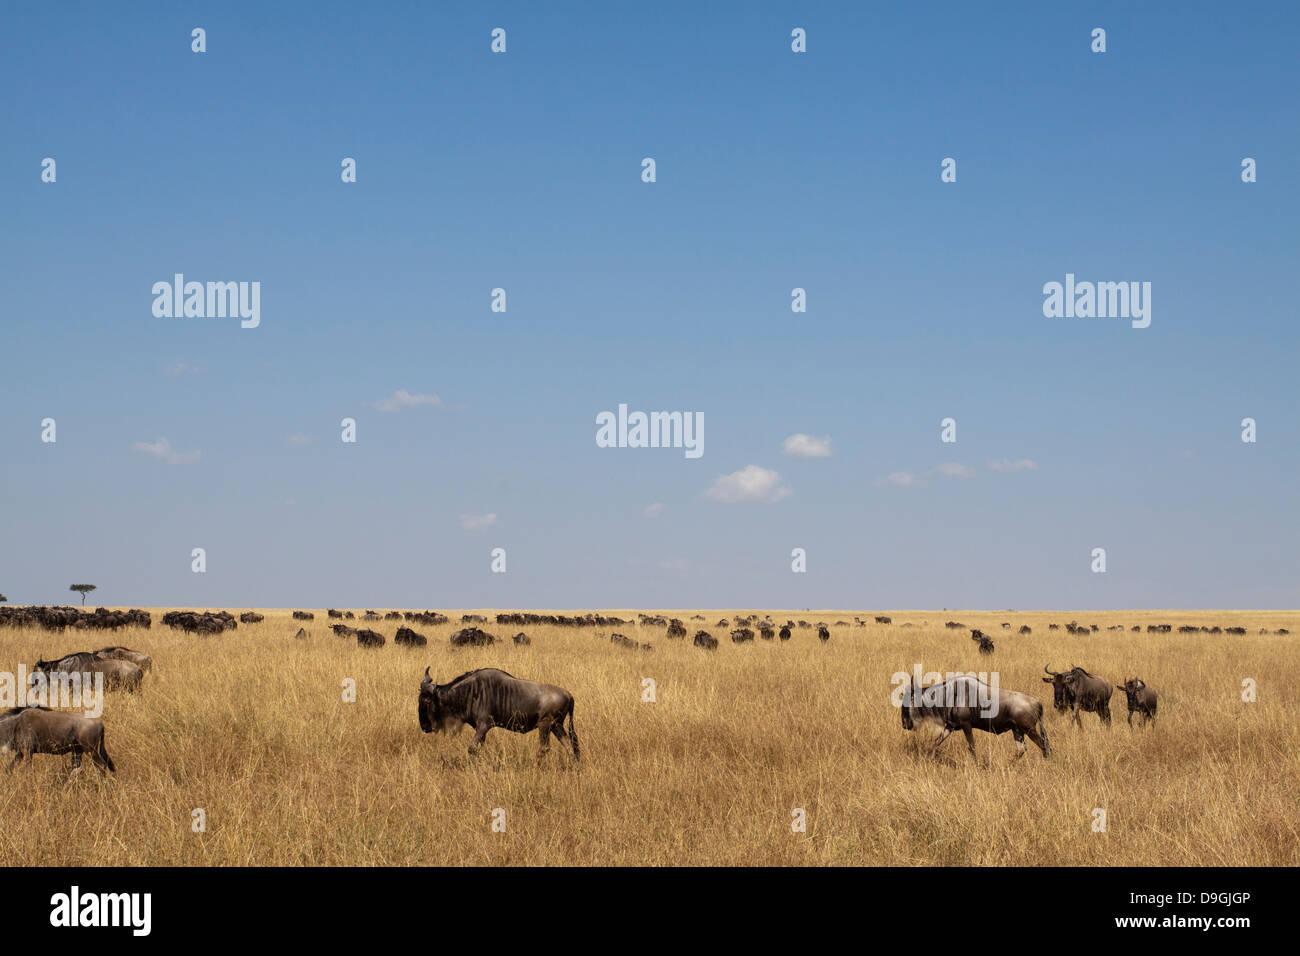 Wildebeest, connochaetes taurinus, on annual migration, Masai Mara, Kenya, Africa - Stock Image